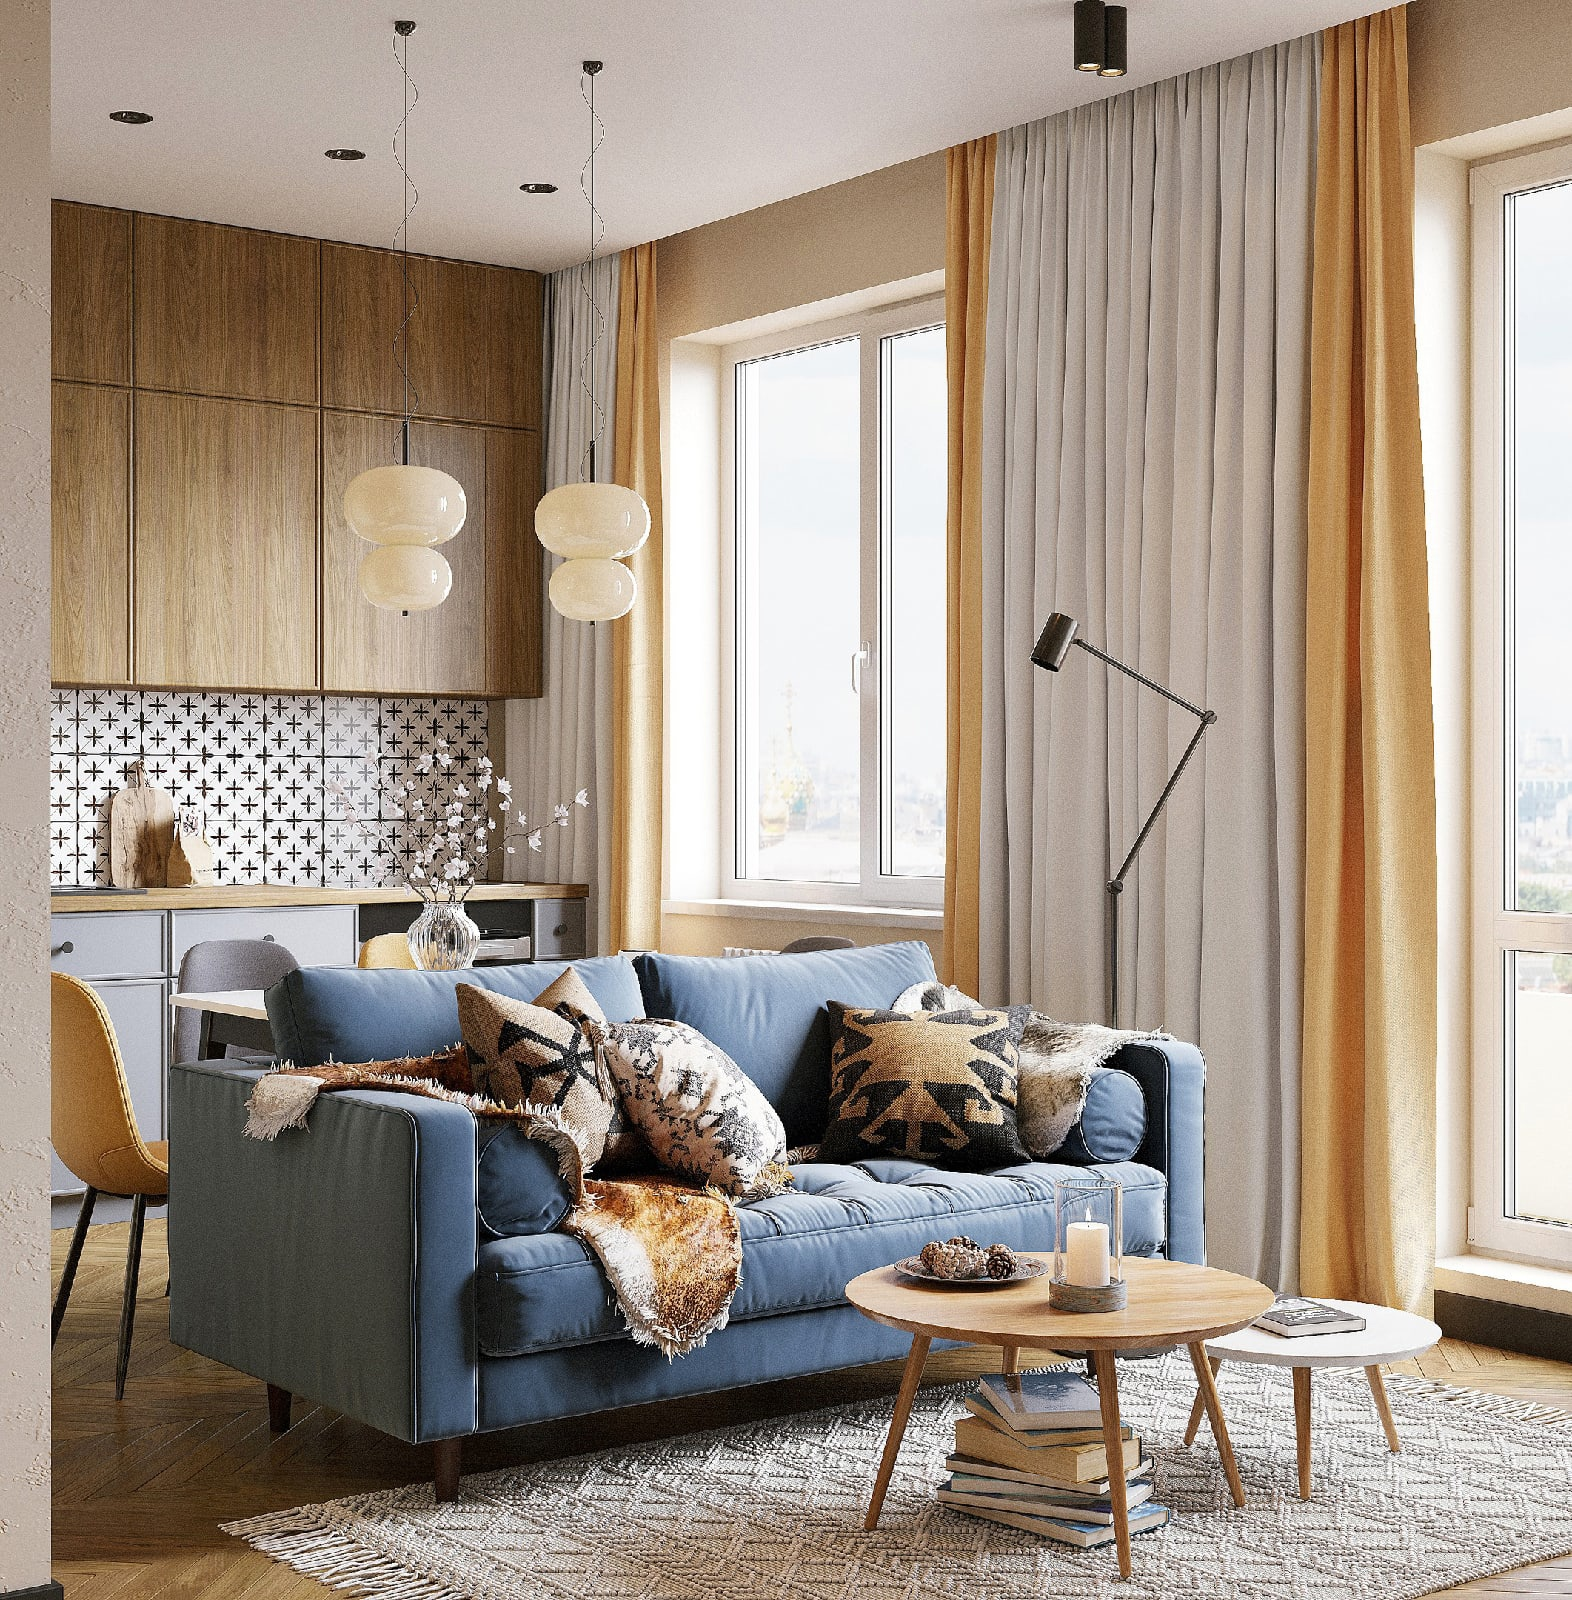 Дизайн-проект квартиры-студии 35 кв.